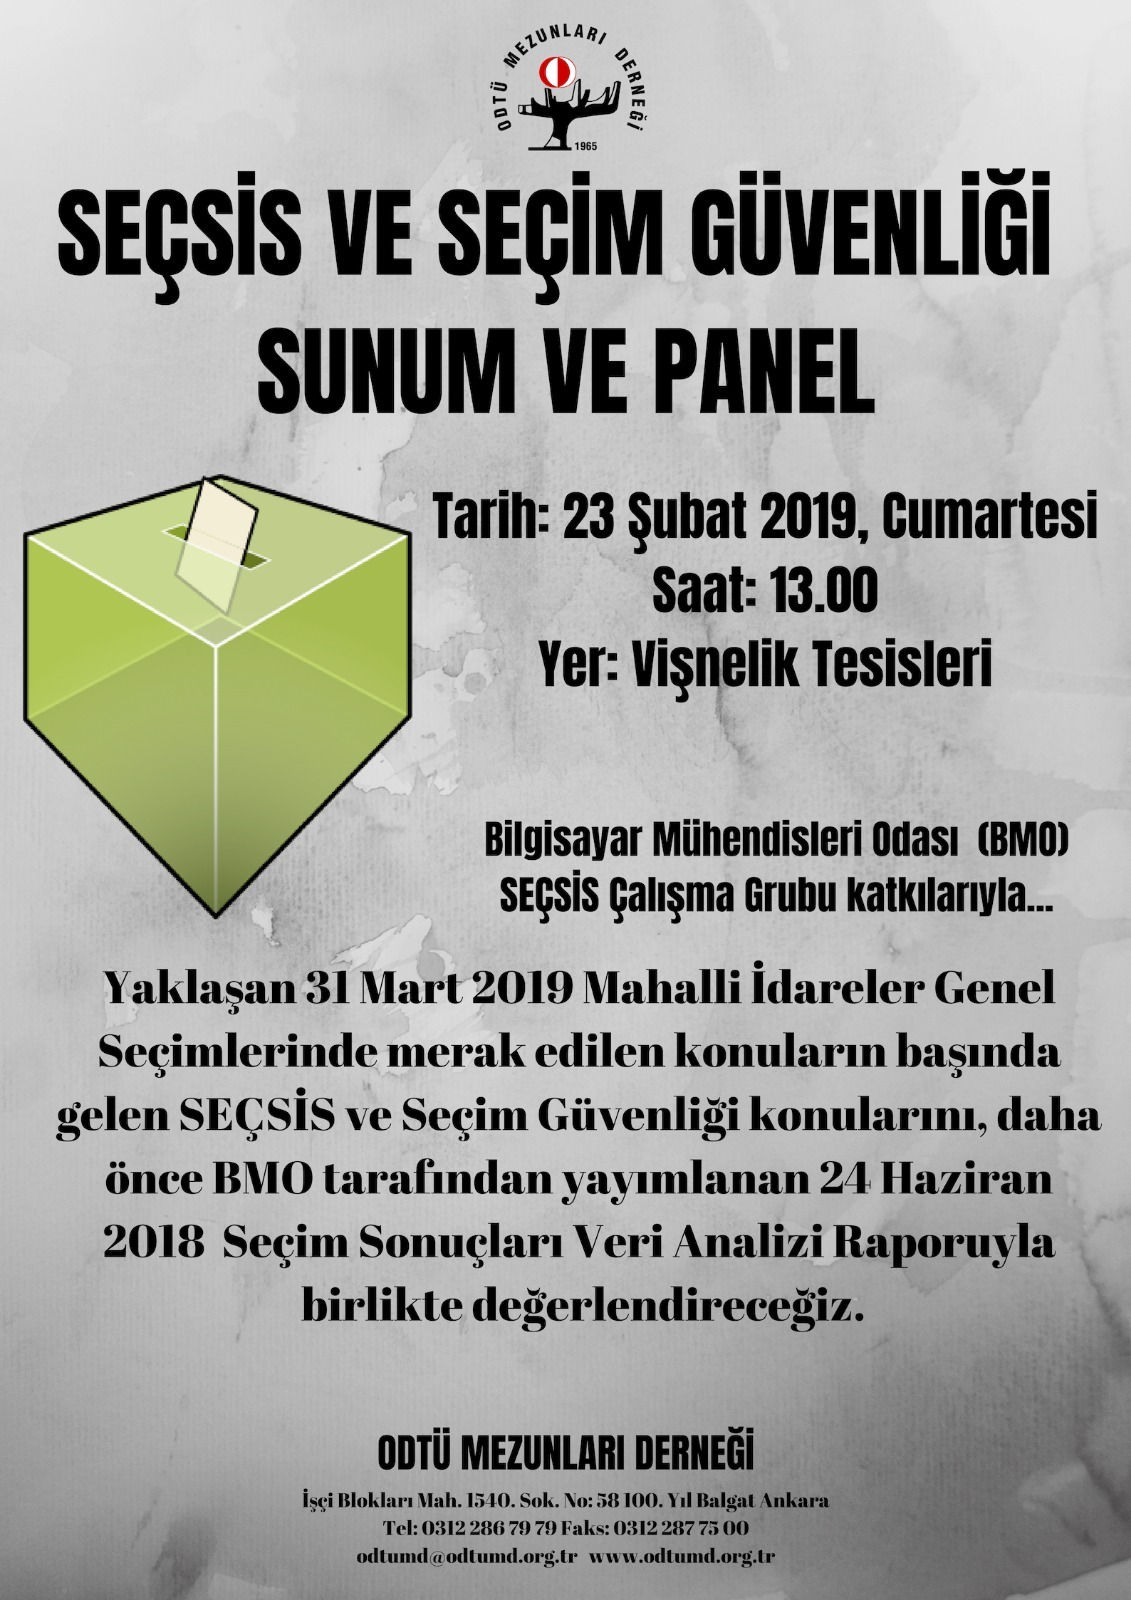 ODTU-MD_SECSiS_SecimGuvenligi_23-02-2019